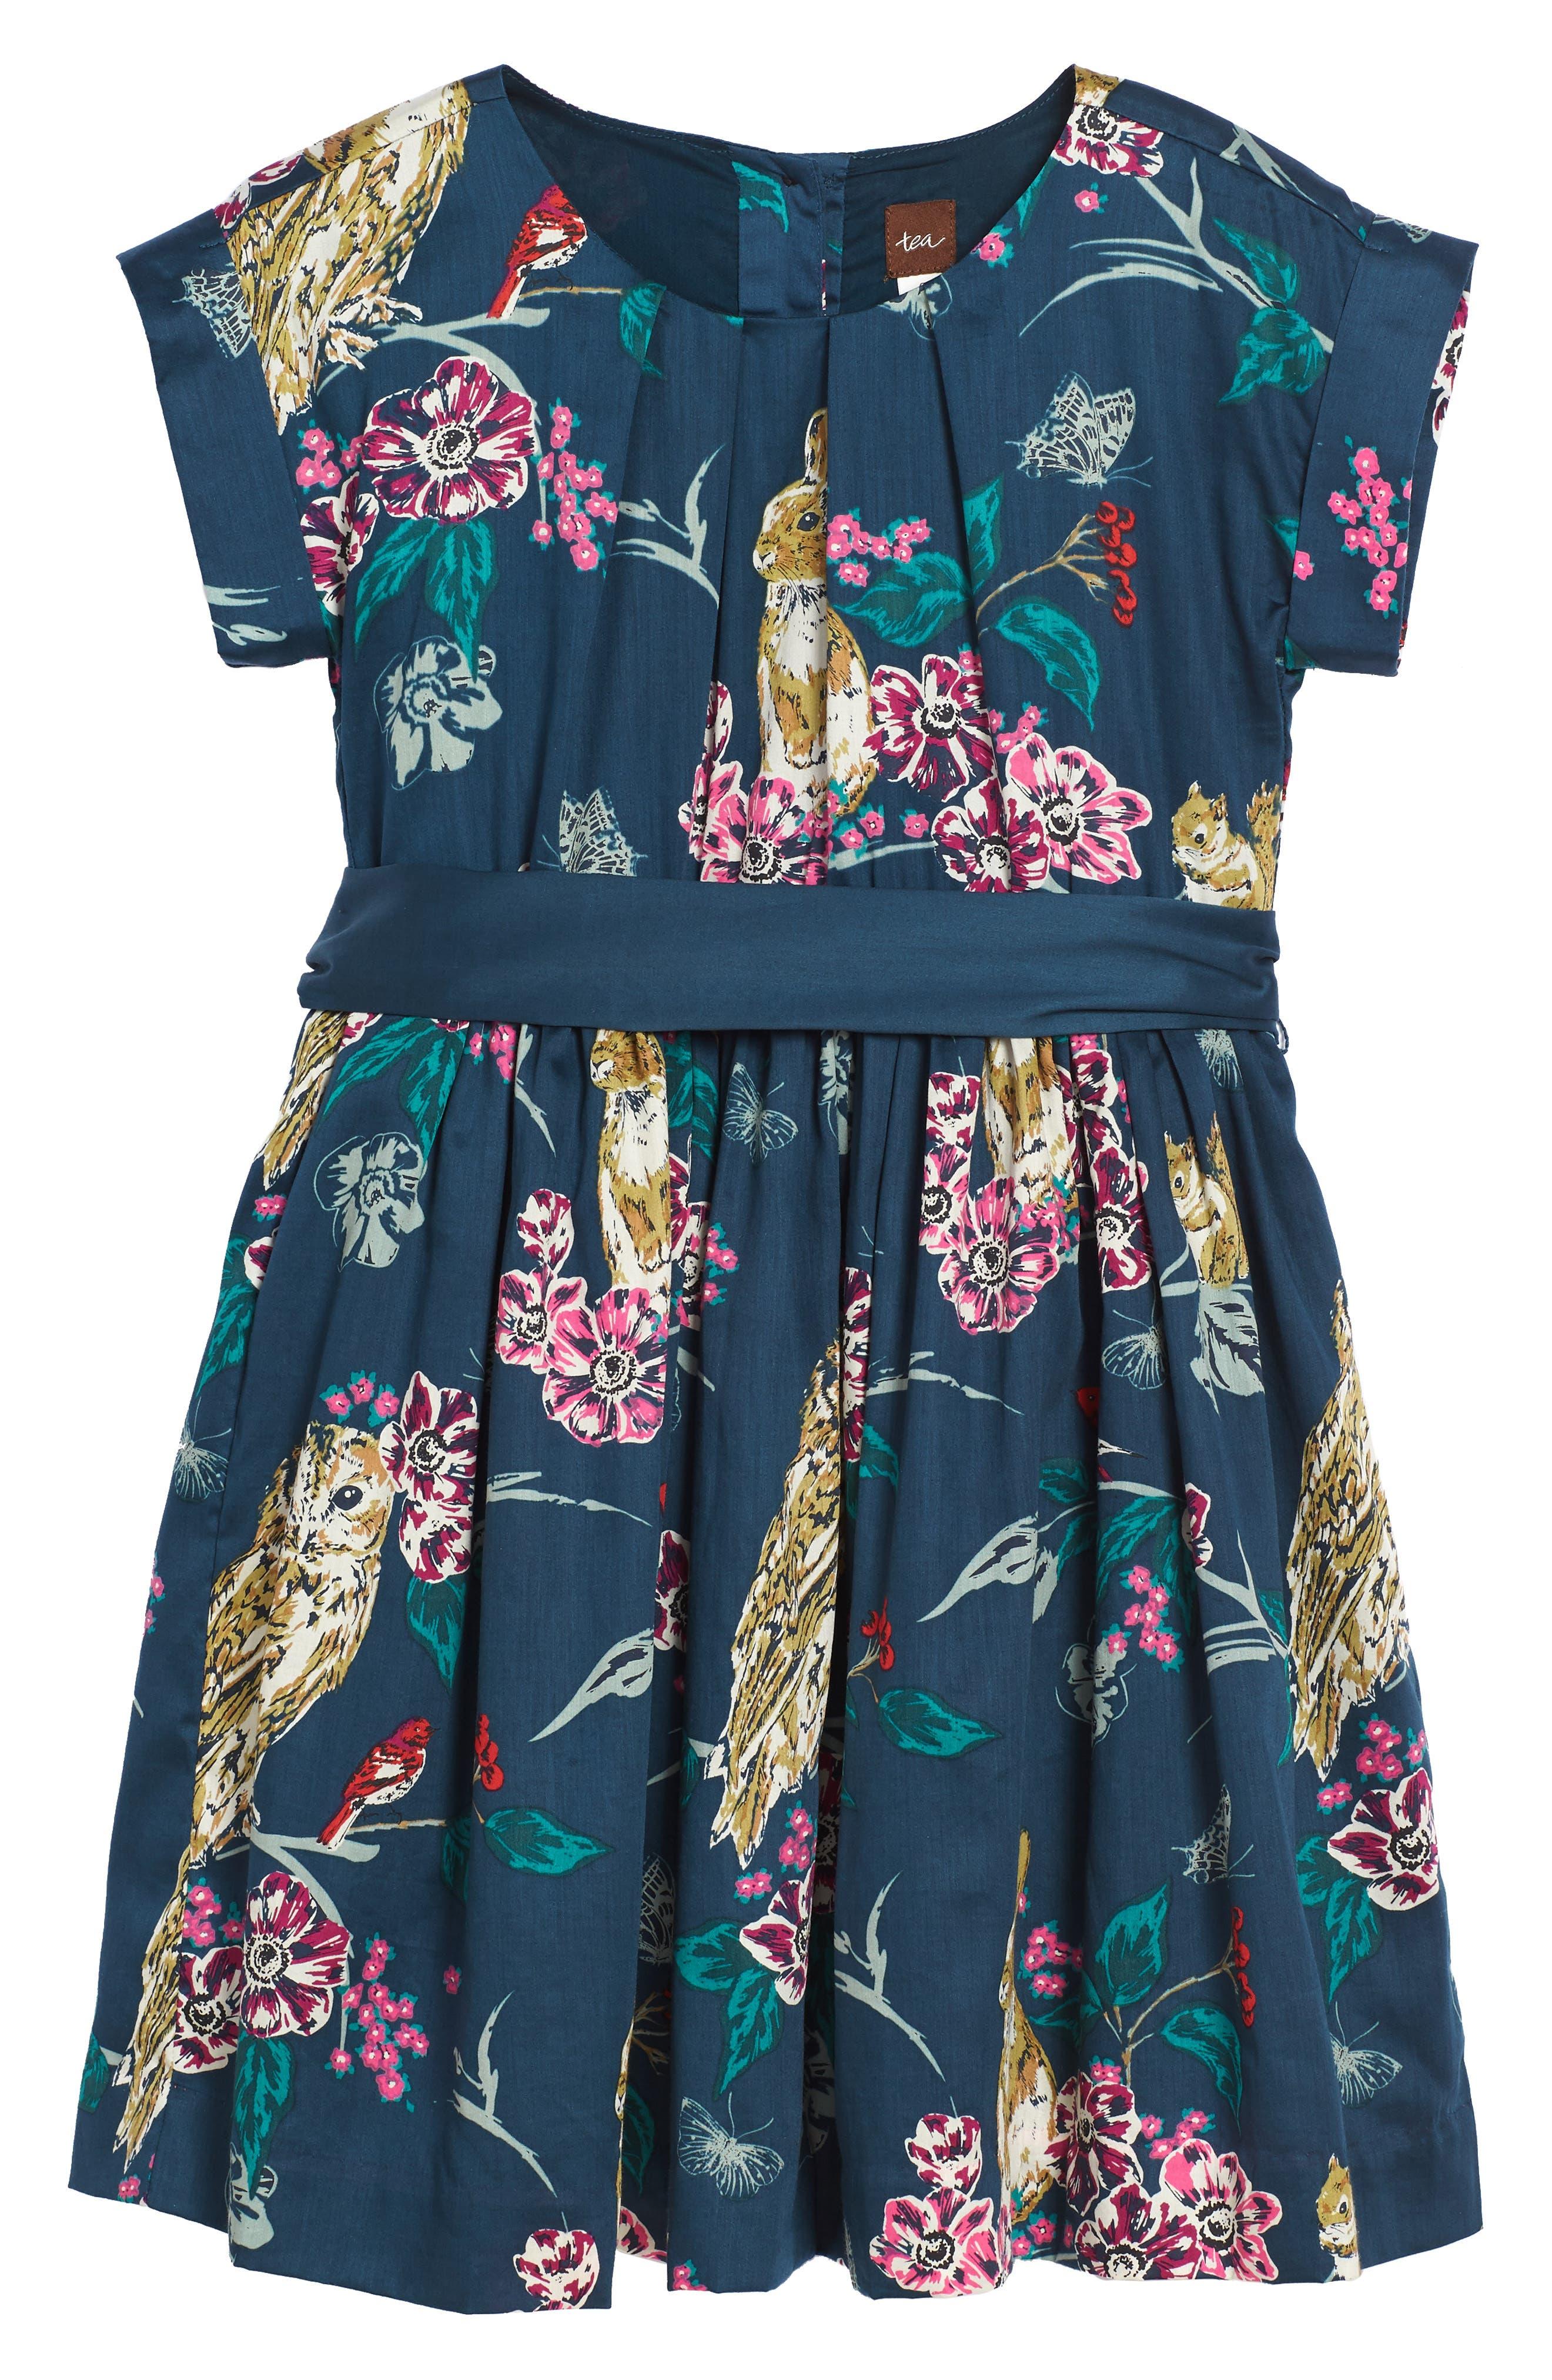 Alternate Image 1 Selected - Tea Collection Caledonian Forest Sash Dress (Toddler Girls, Little Girls & Big Girls)